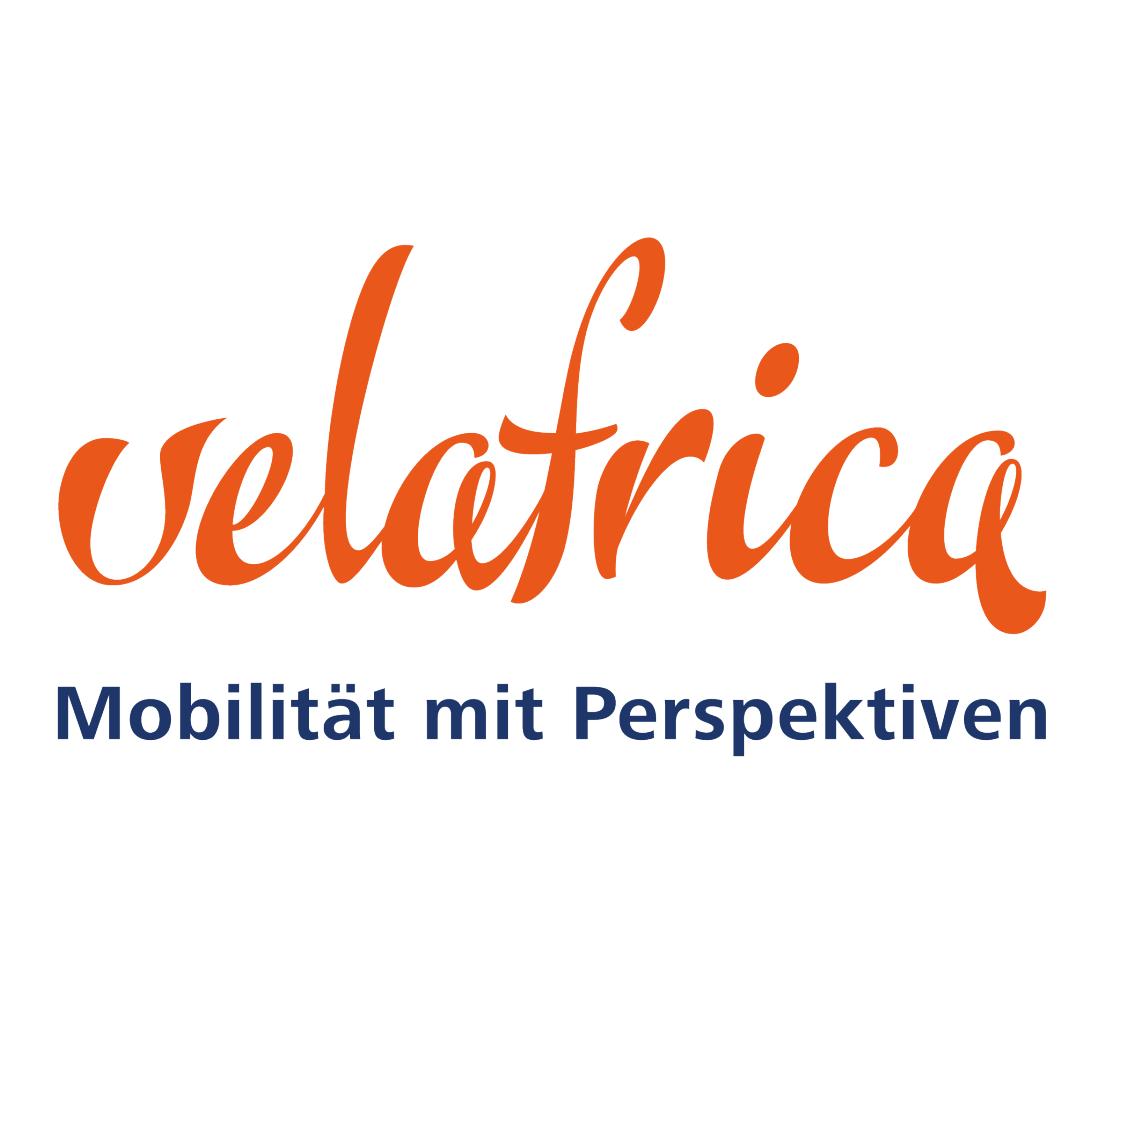 velafrica_RGB_angepasst1-1024x840png